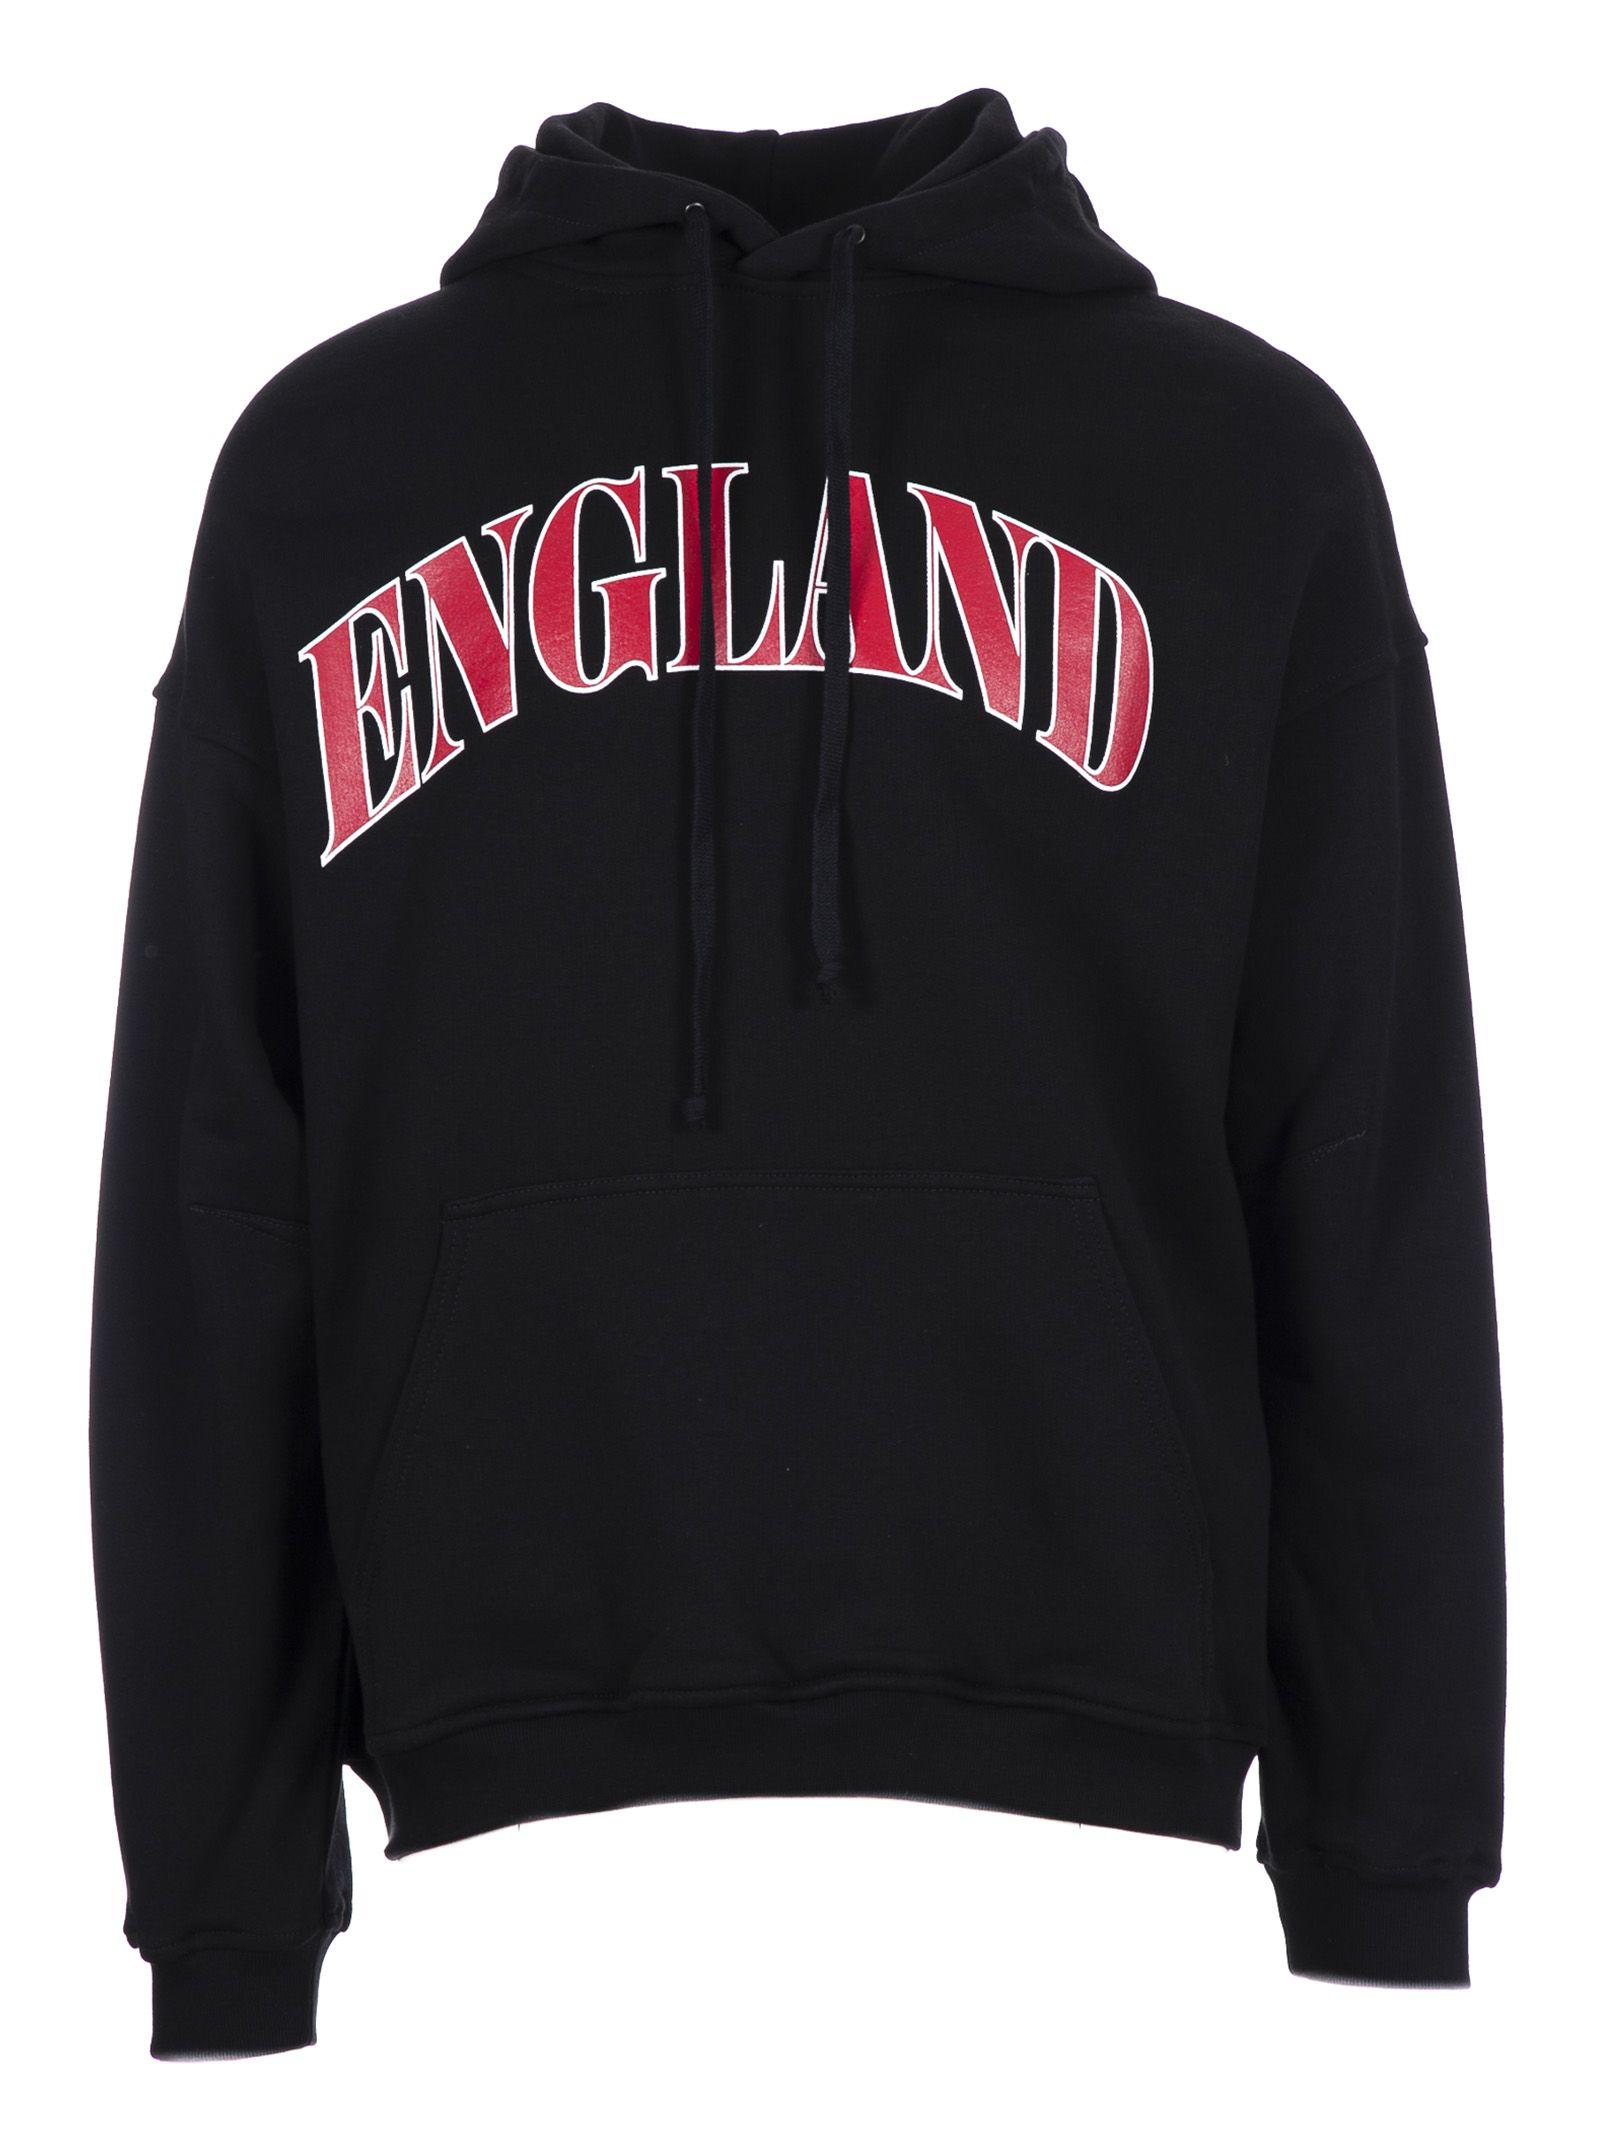 Represent England T-shirt